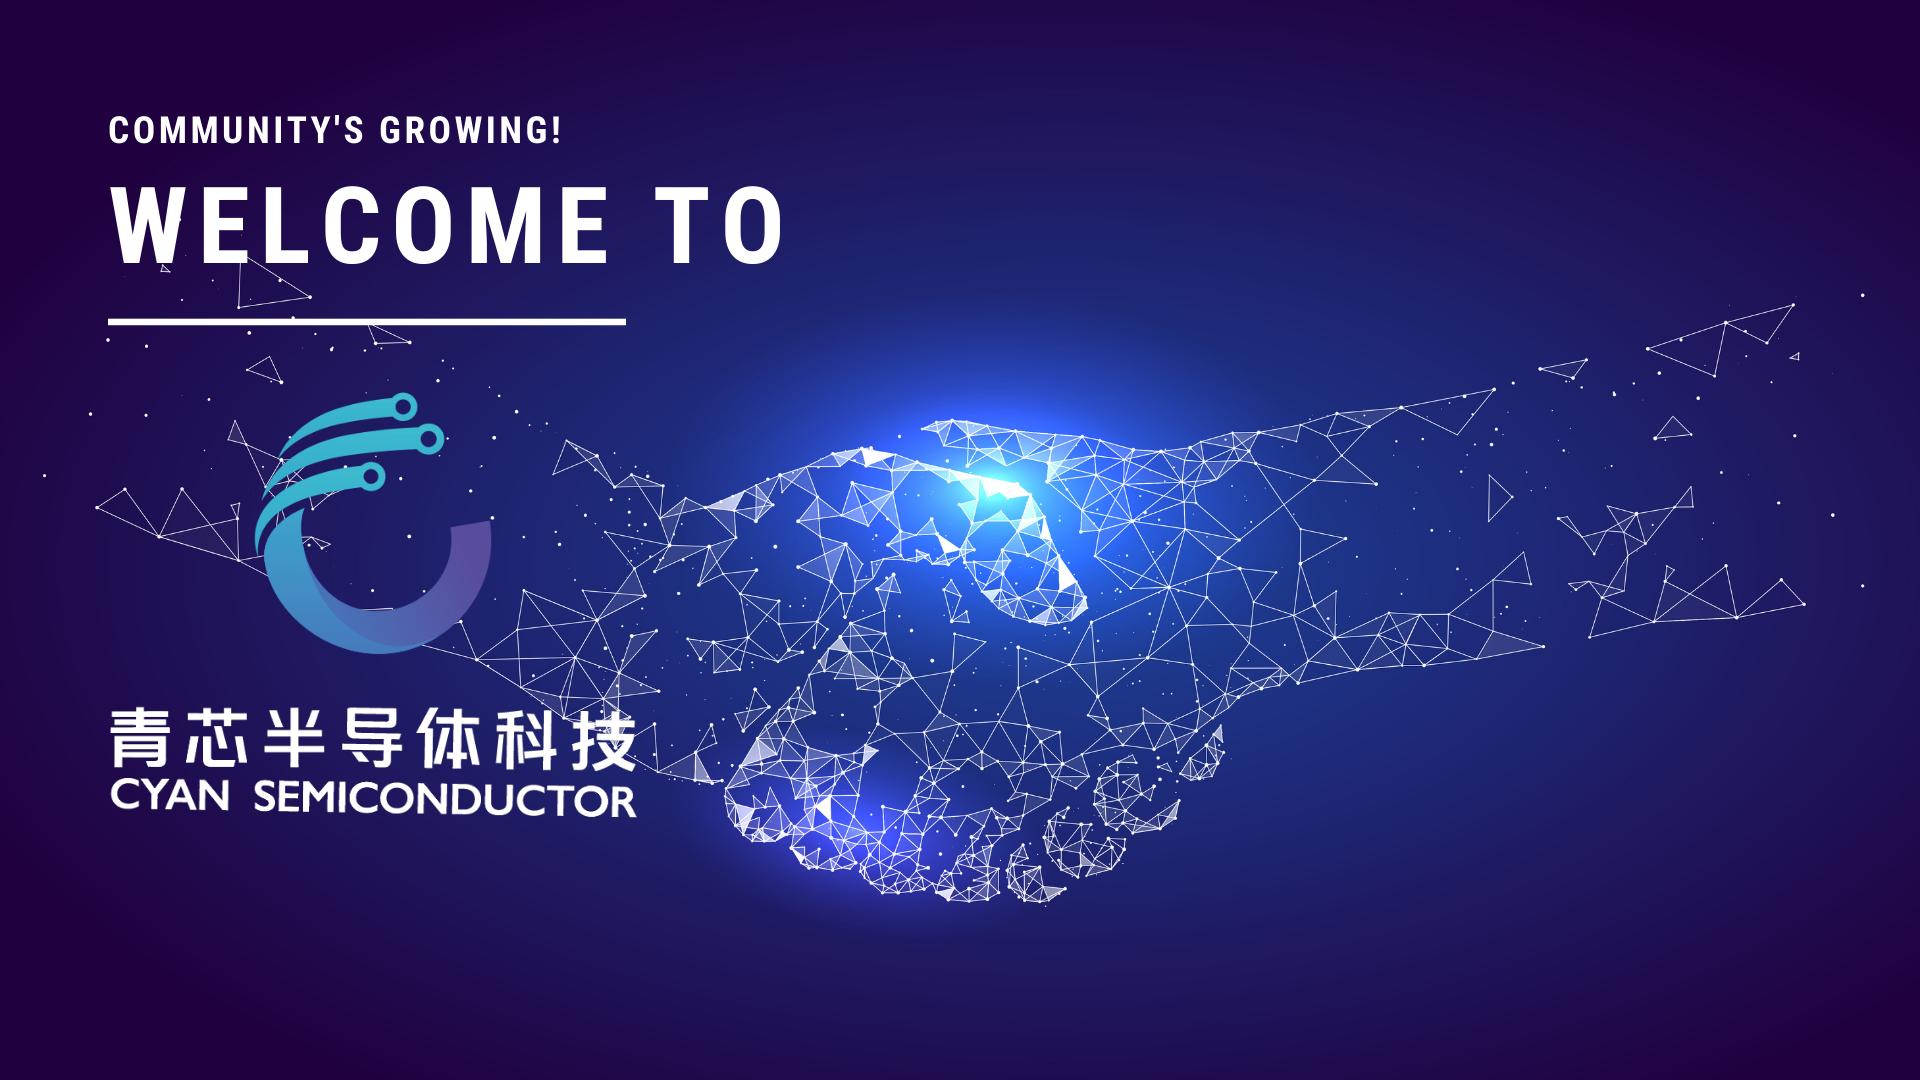 WELCOME TO CYAN SEMICONDUCTOR 青芯半导体科技